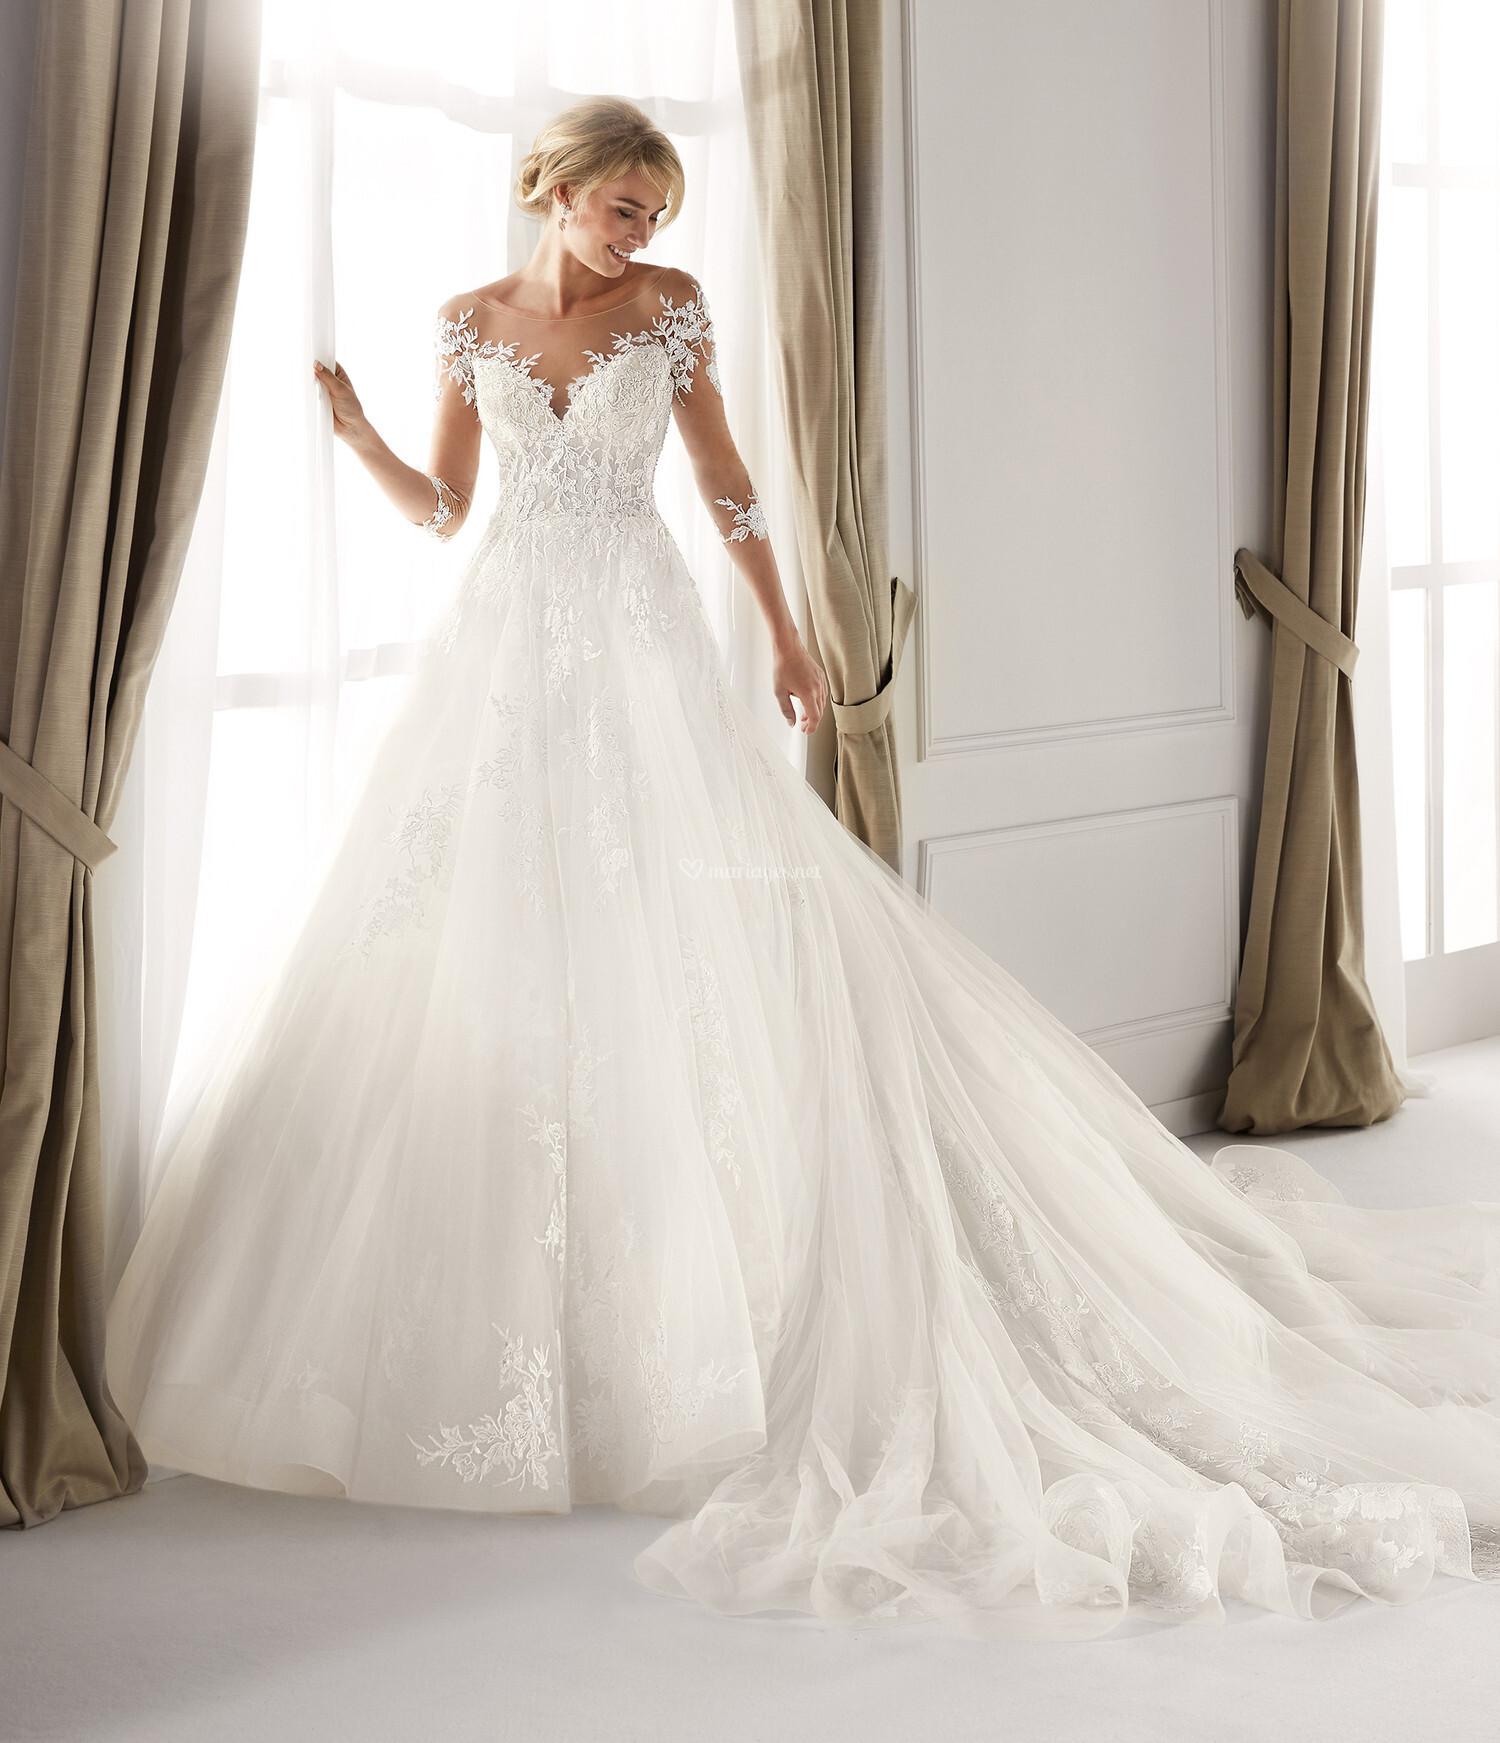 Magasin de robe de mariee st etienne